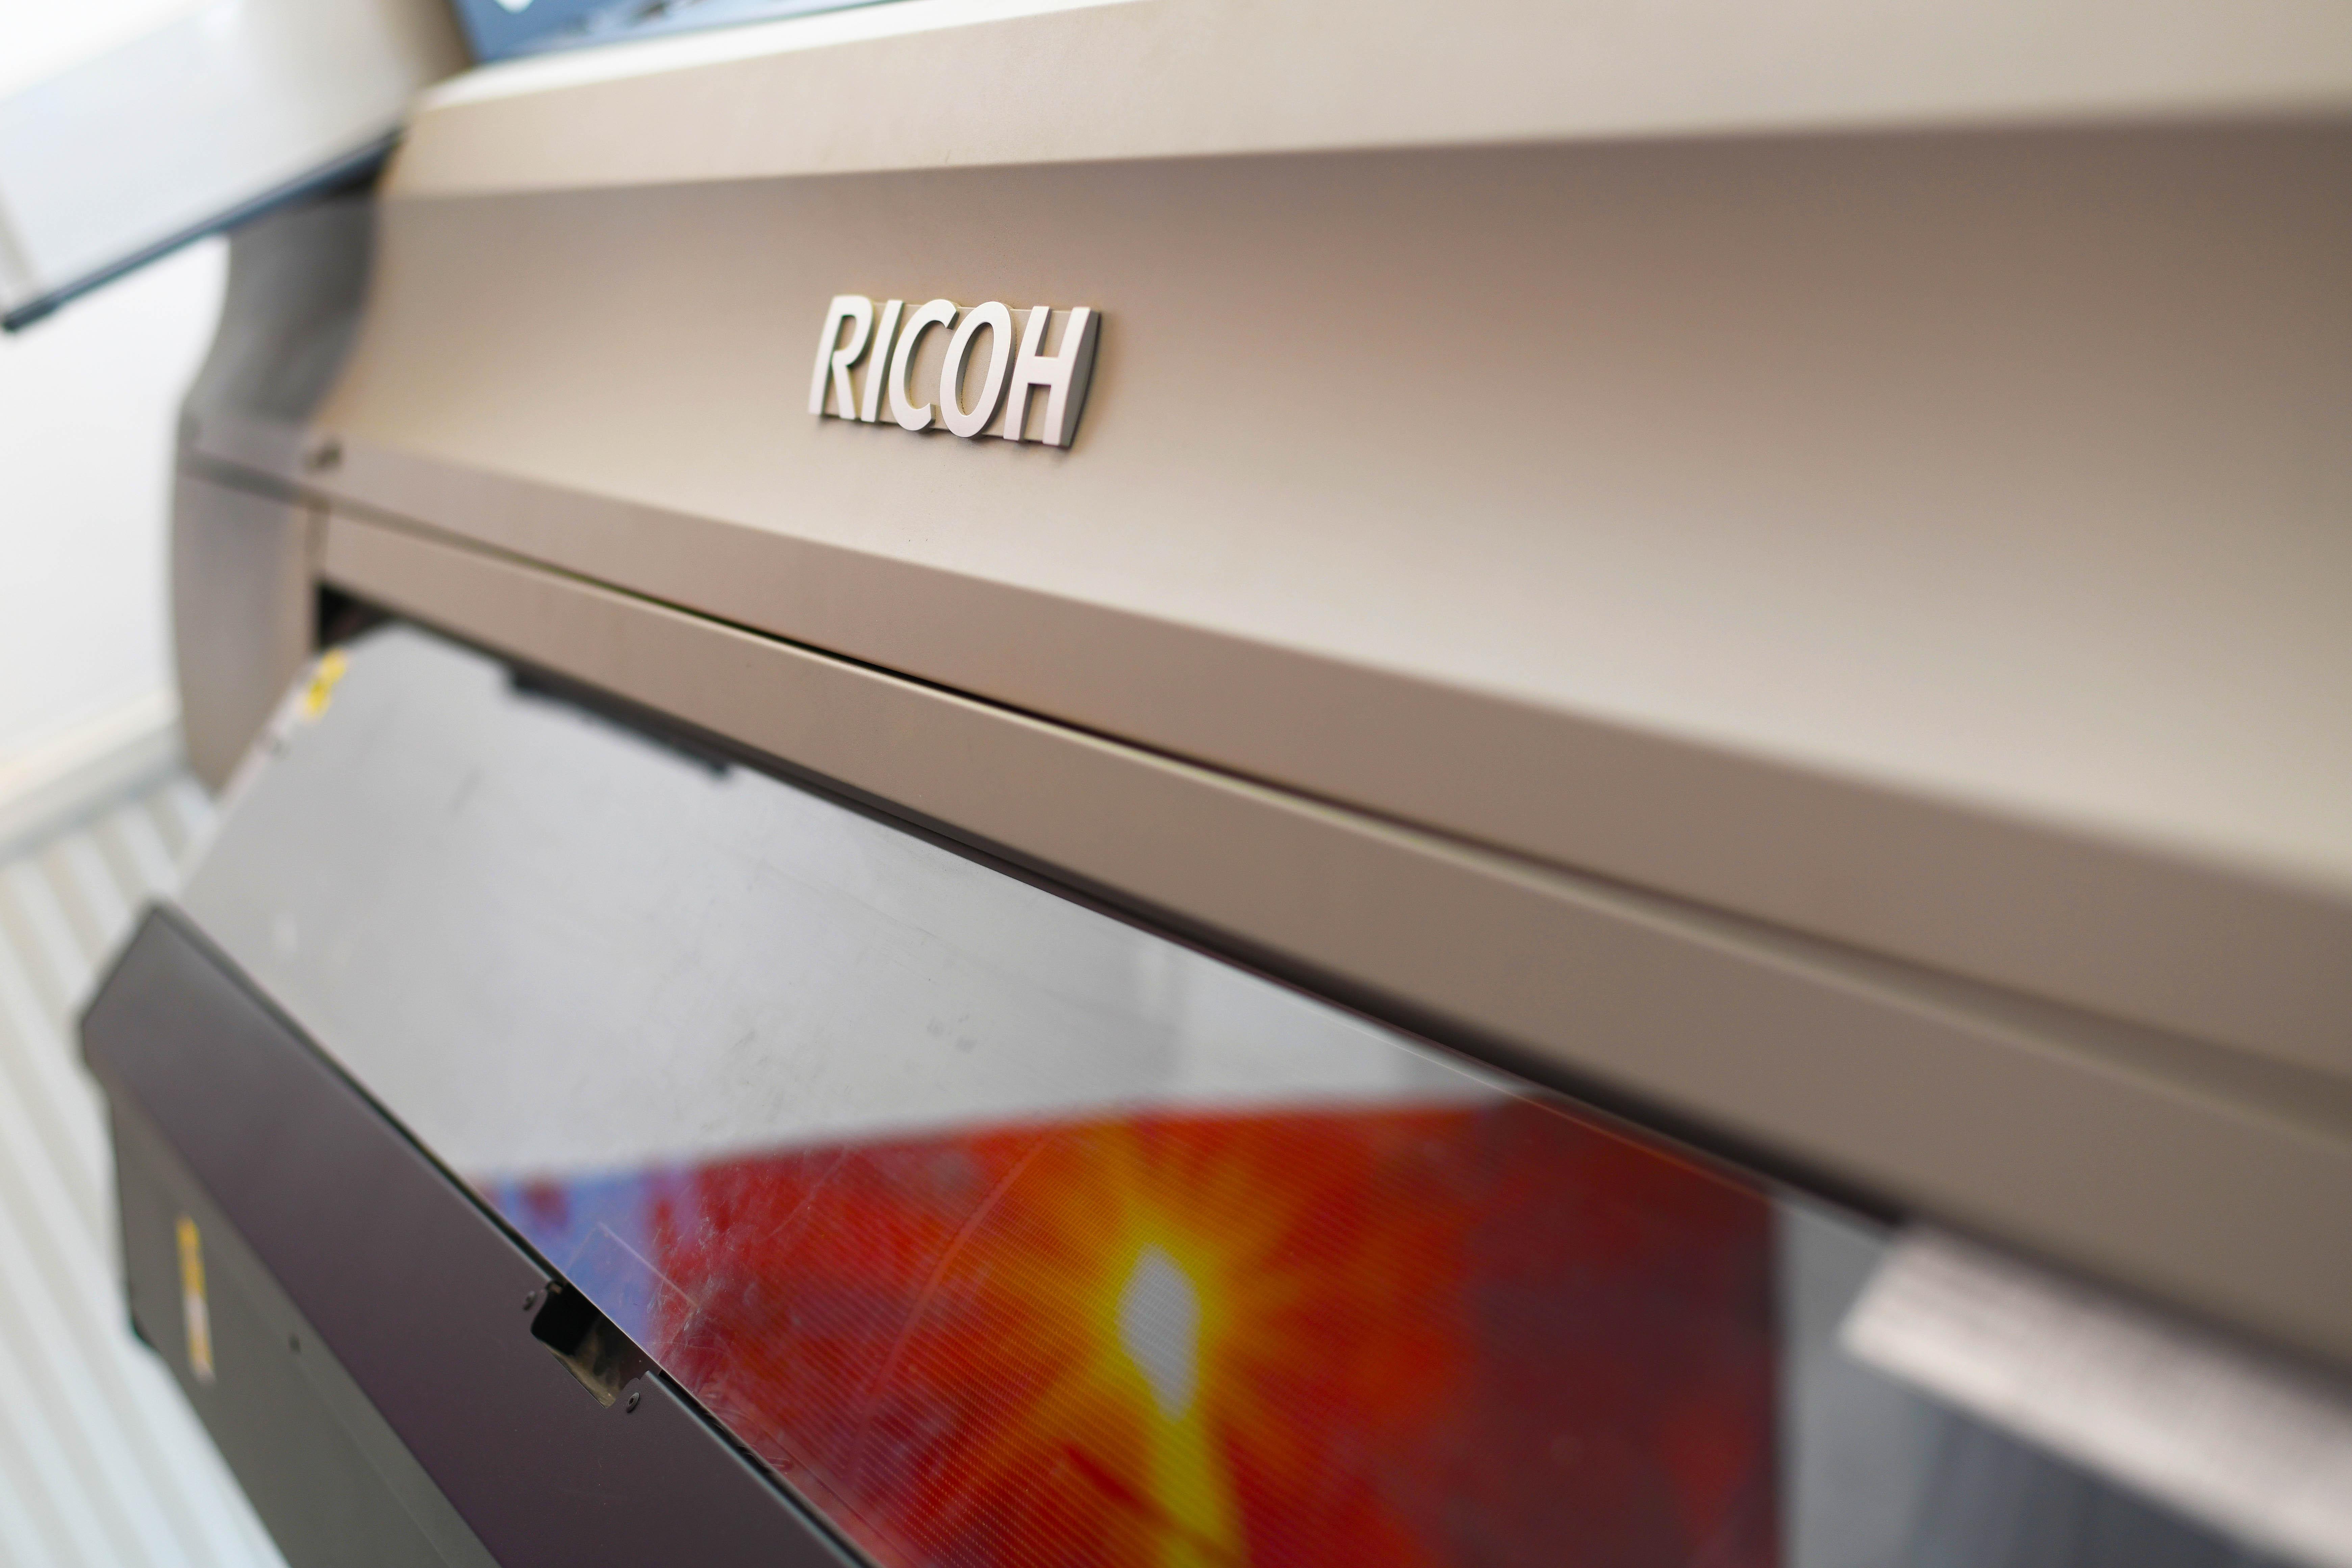 Ricoh L4160